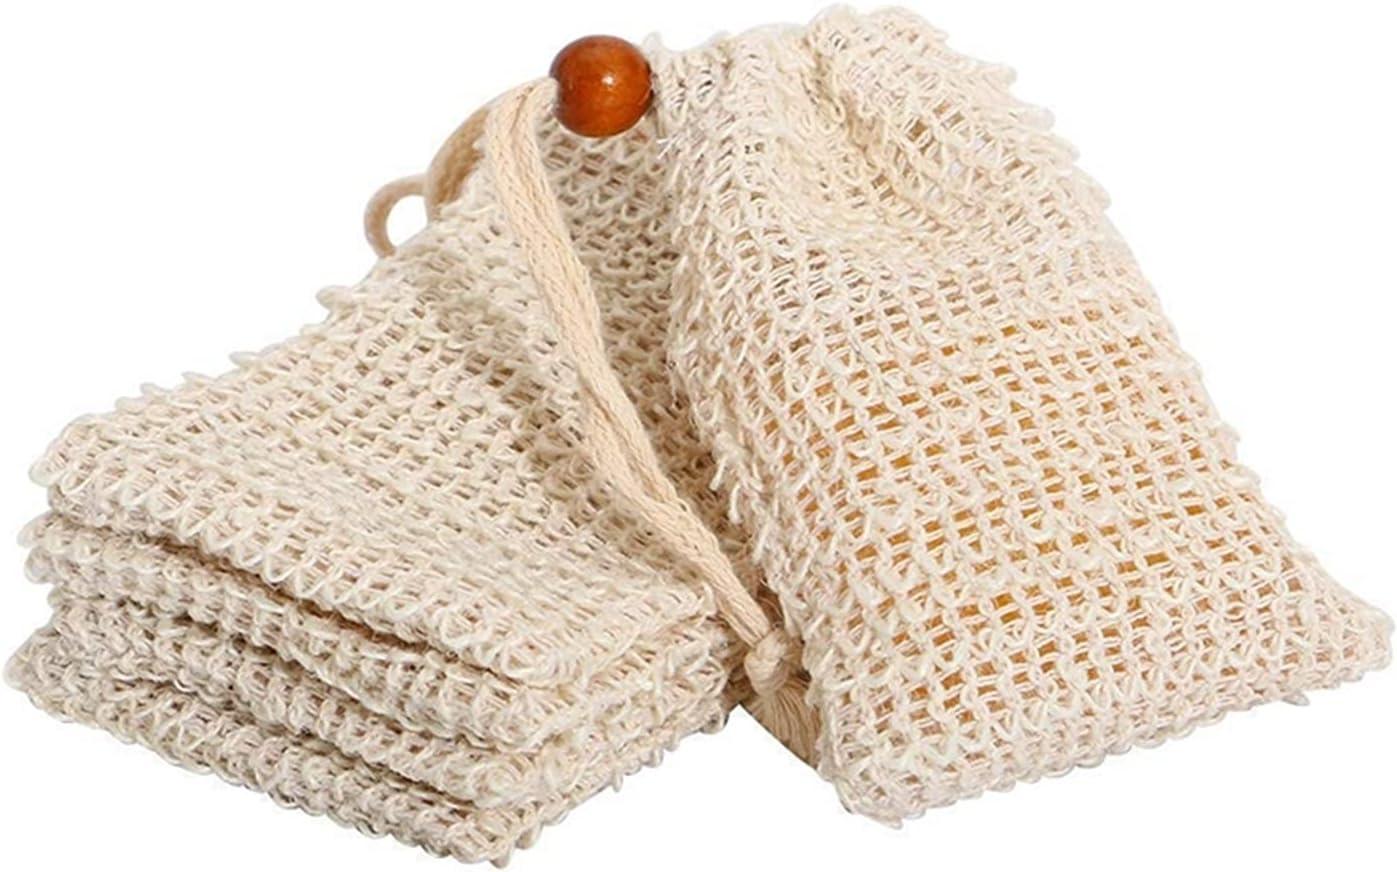 DLX LUDA Shower Bath Sisal Beauty products Bag Philadelphia Mall Exfol Soap Natural